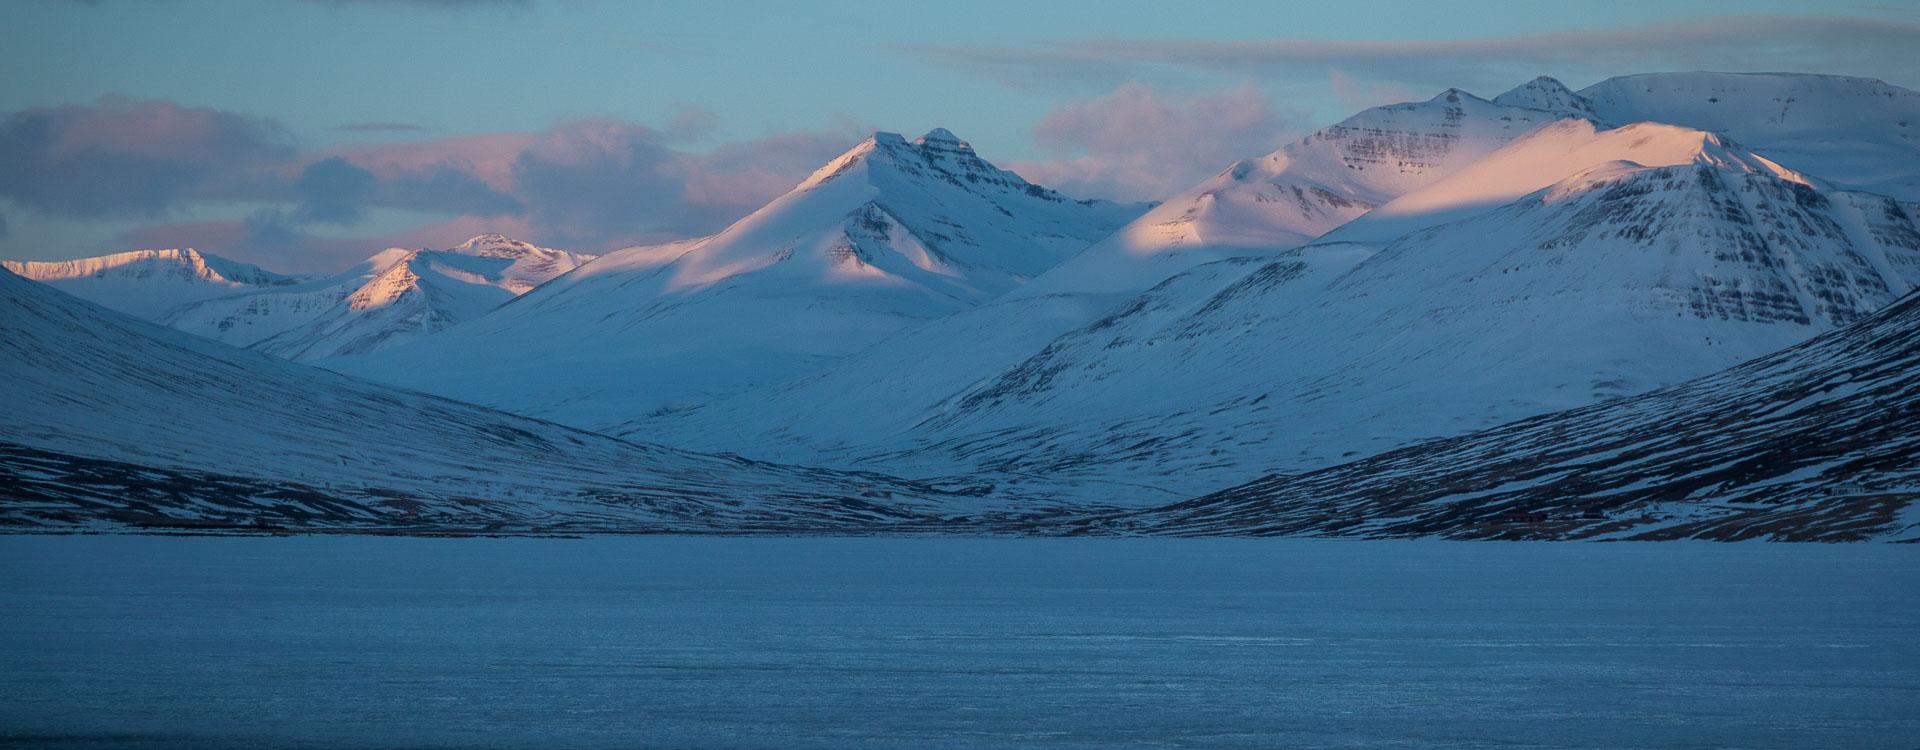 Island Skitouren gehen